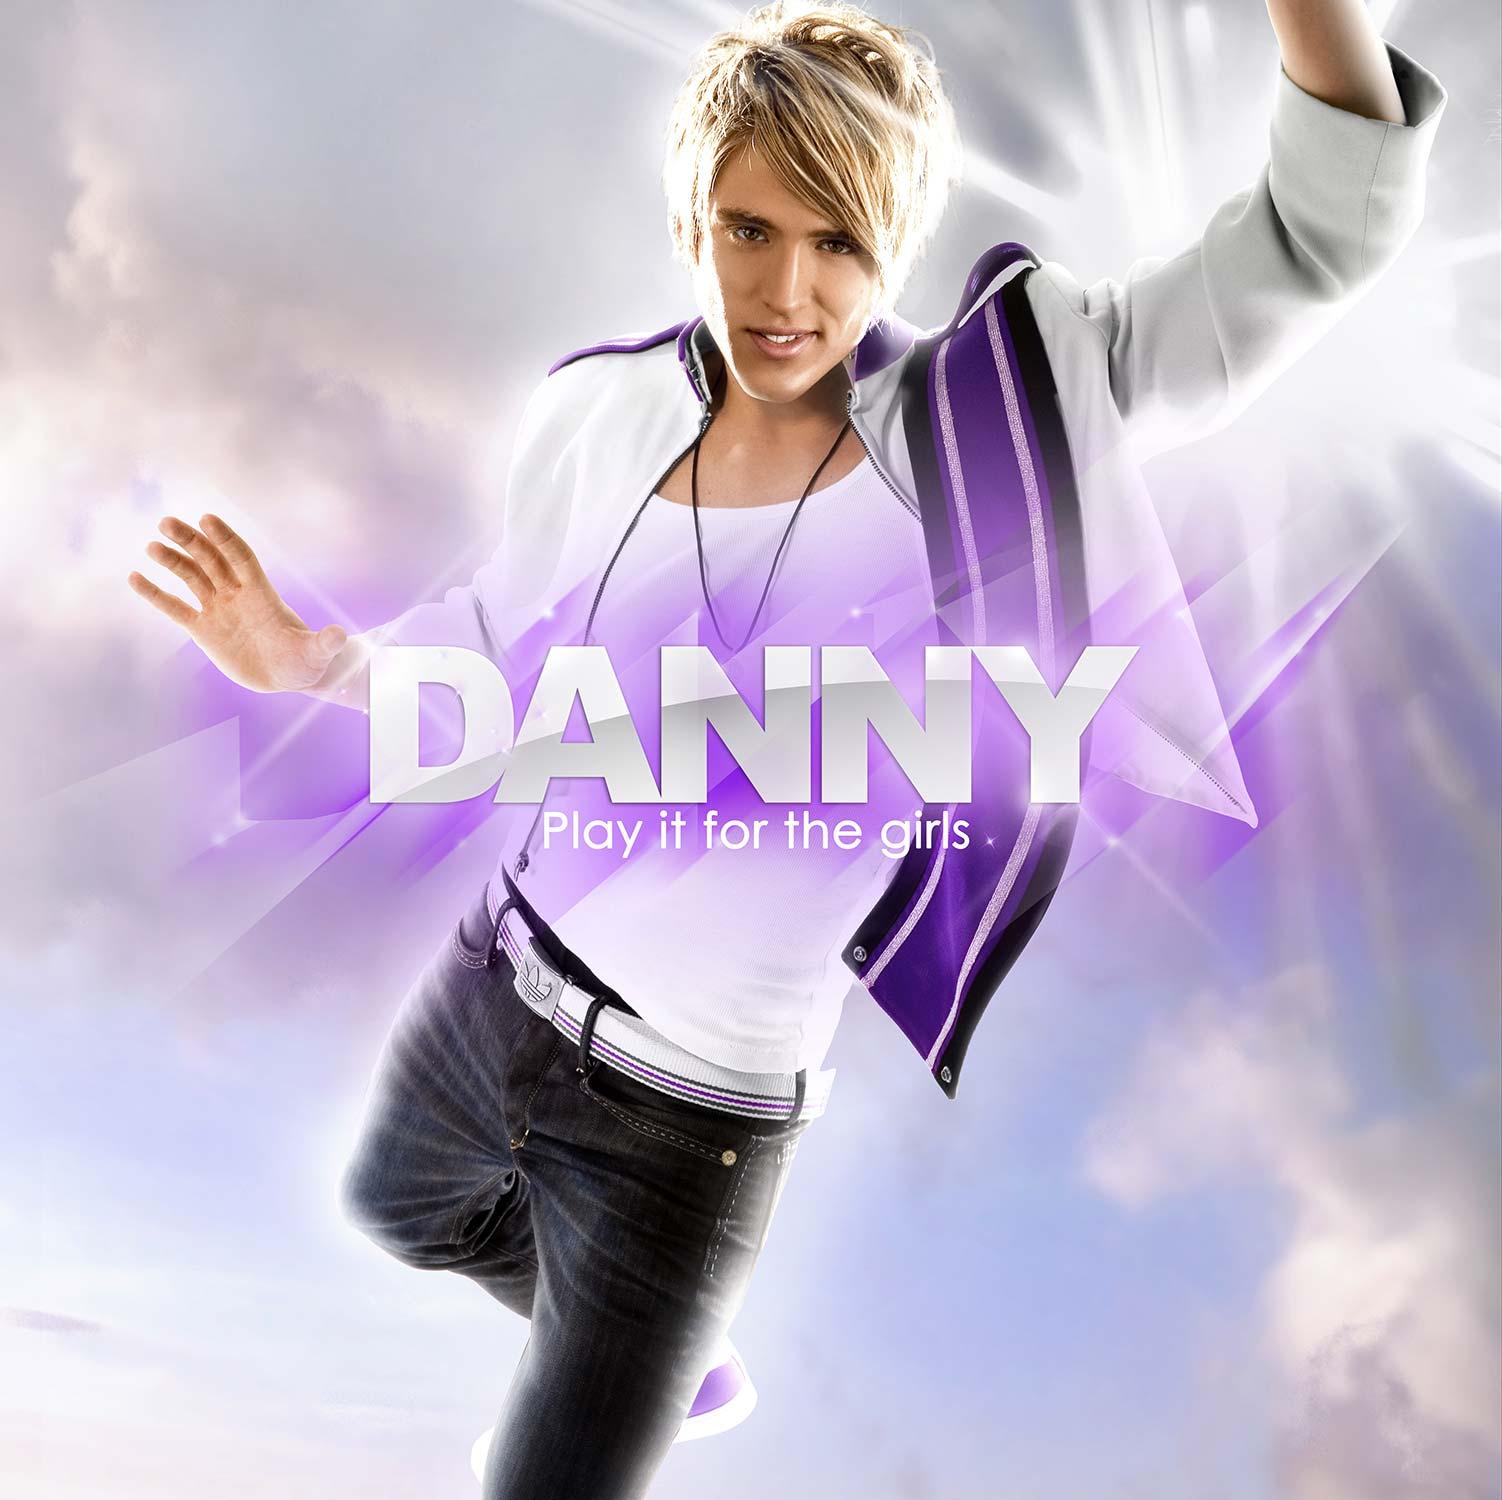 filip-agoo-cederholm-danny-saucedo-sony-music-1500px-1-.jpg